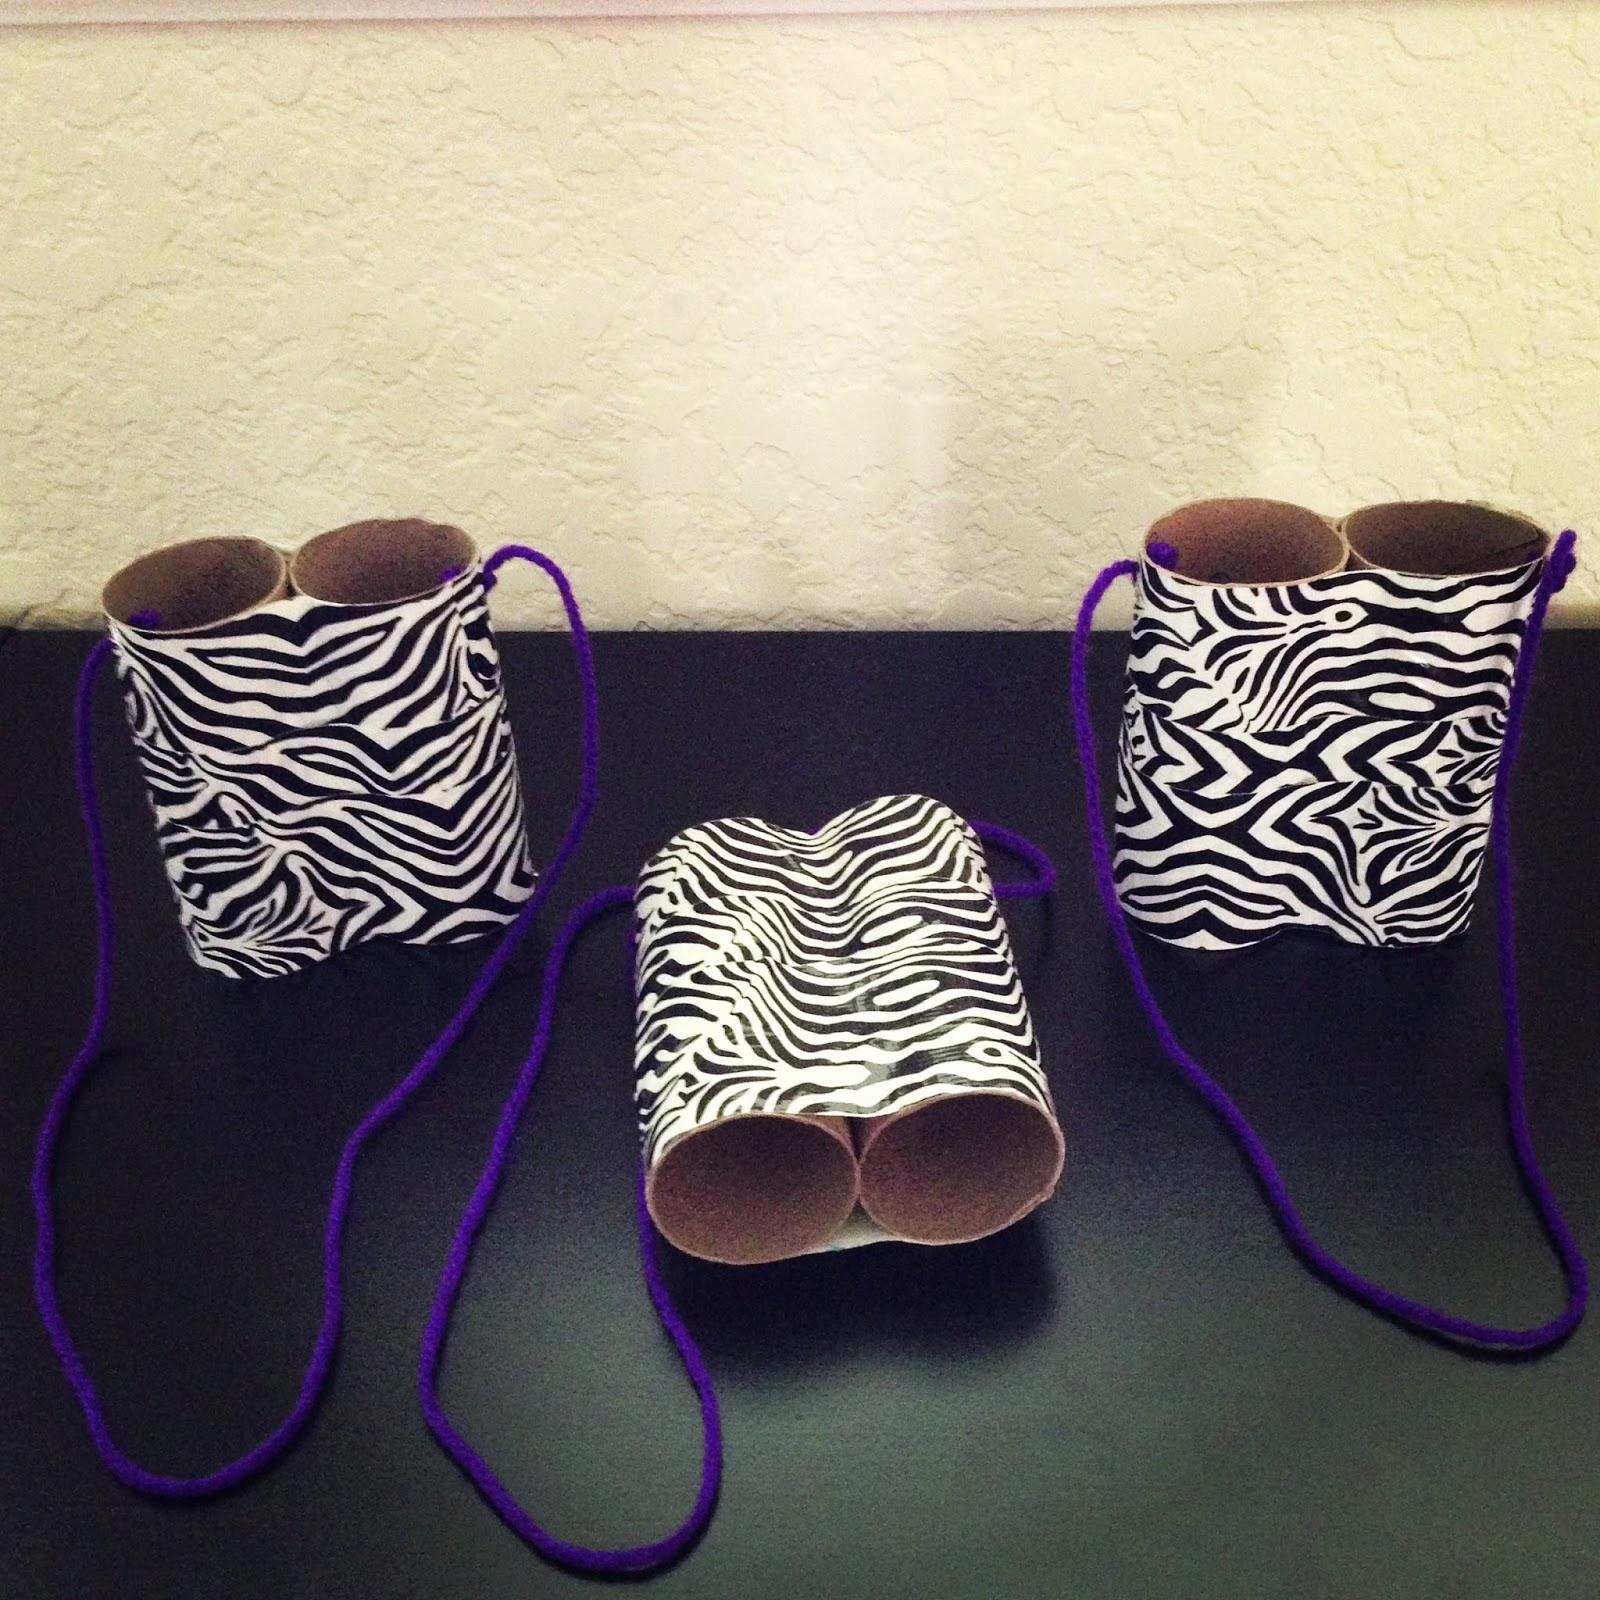 Rolls Of Shoe Lace